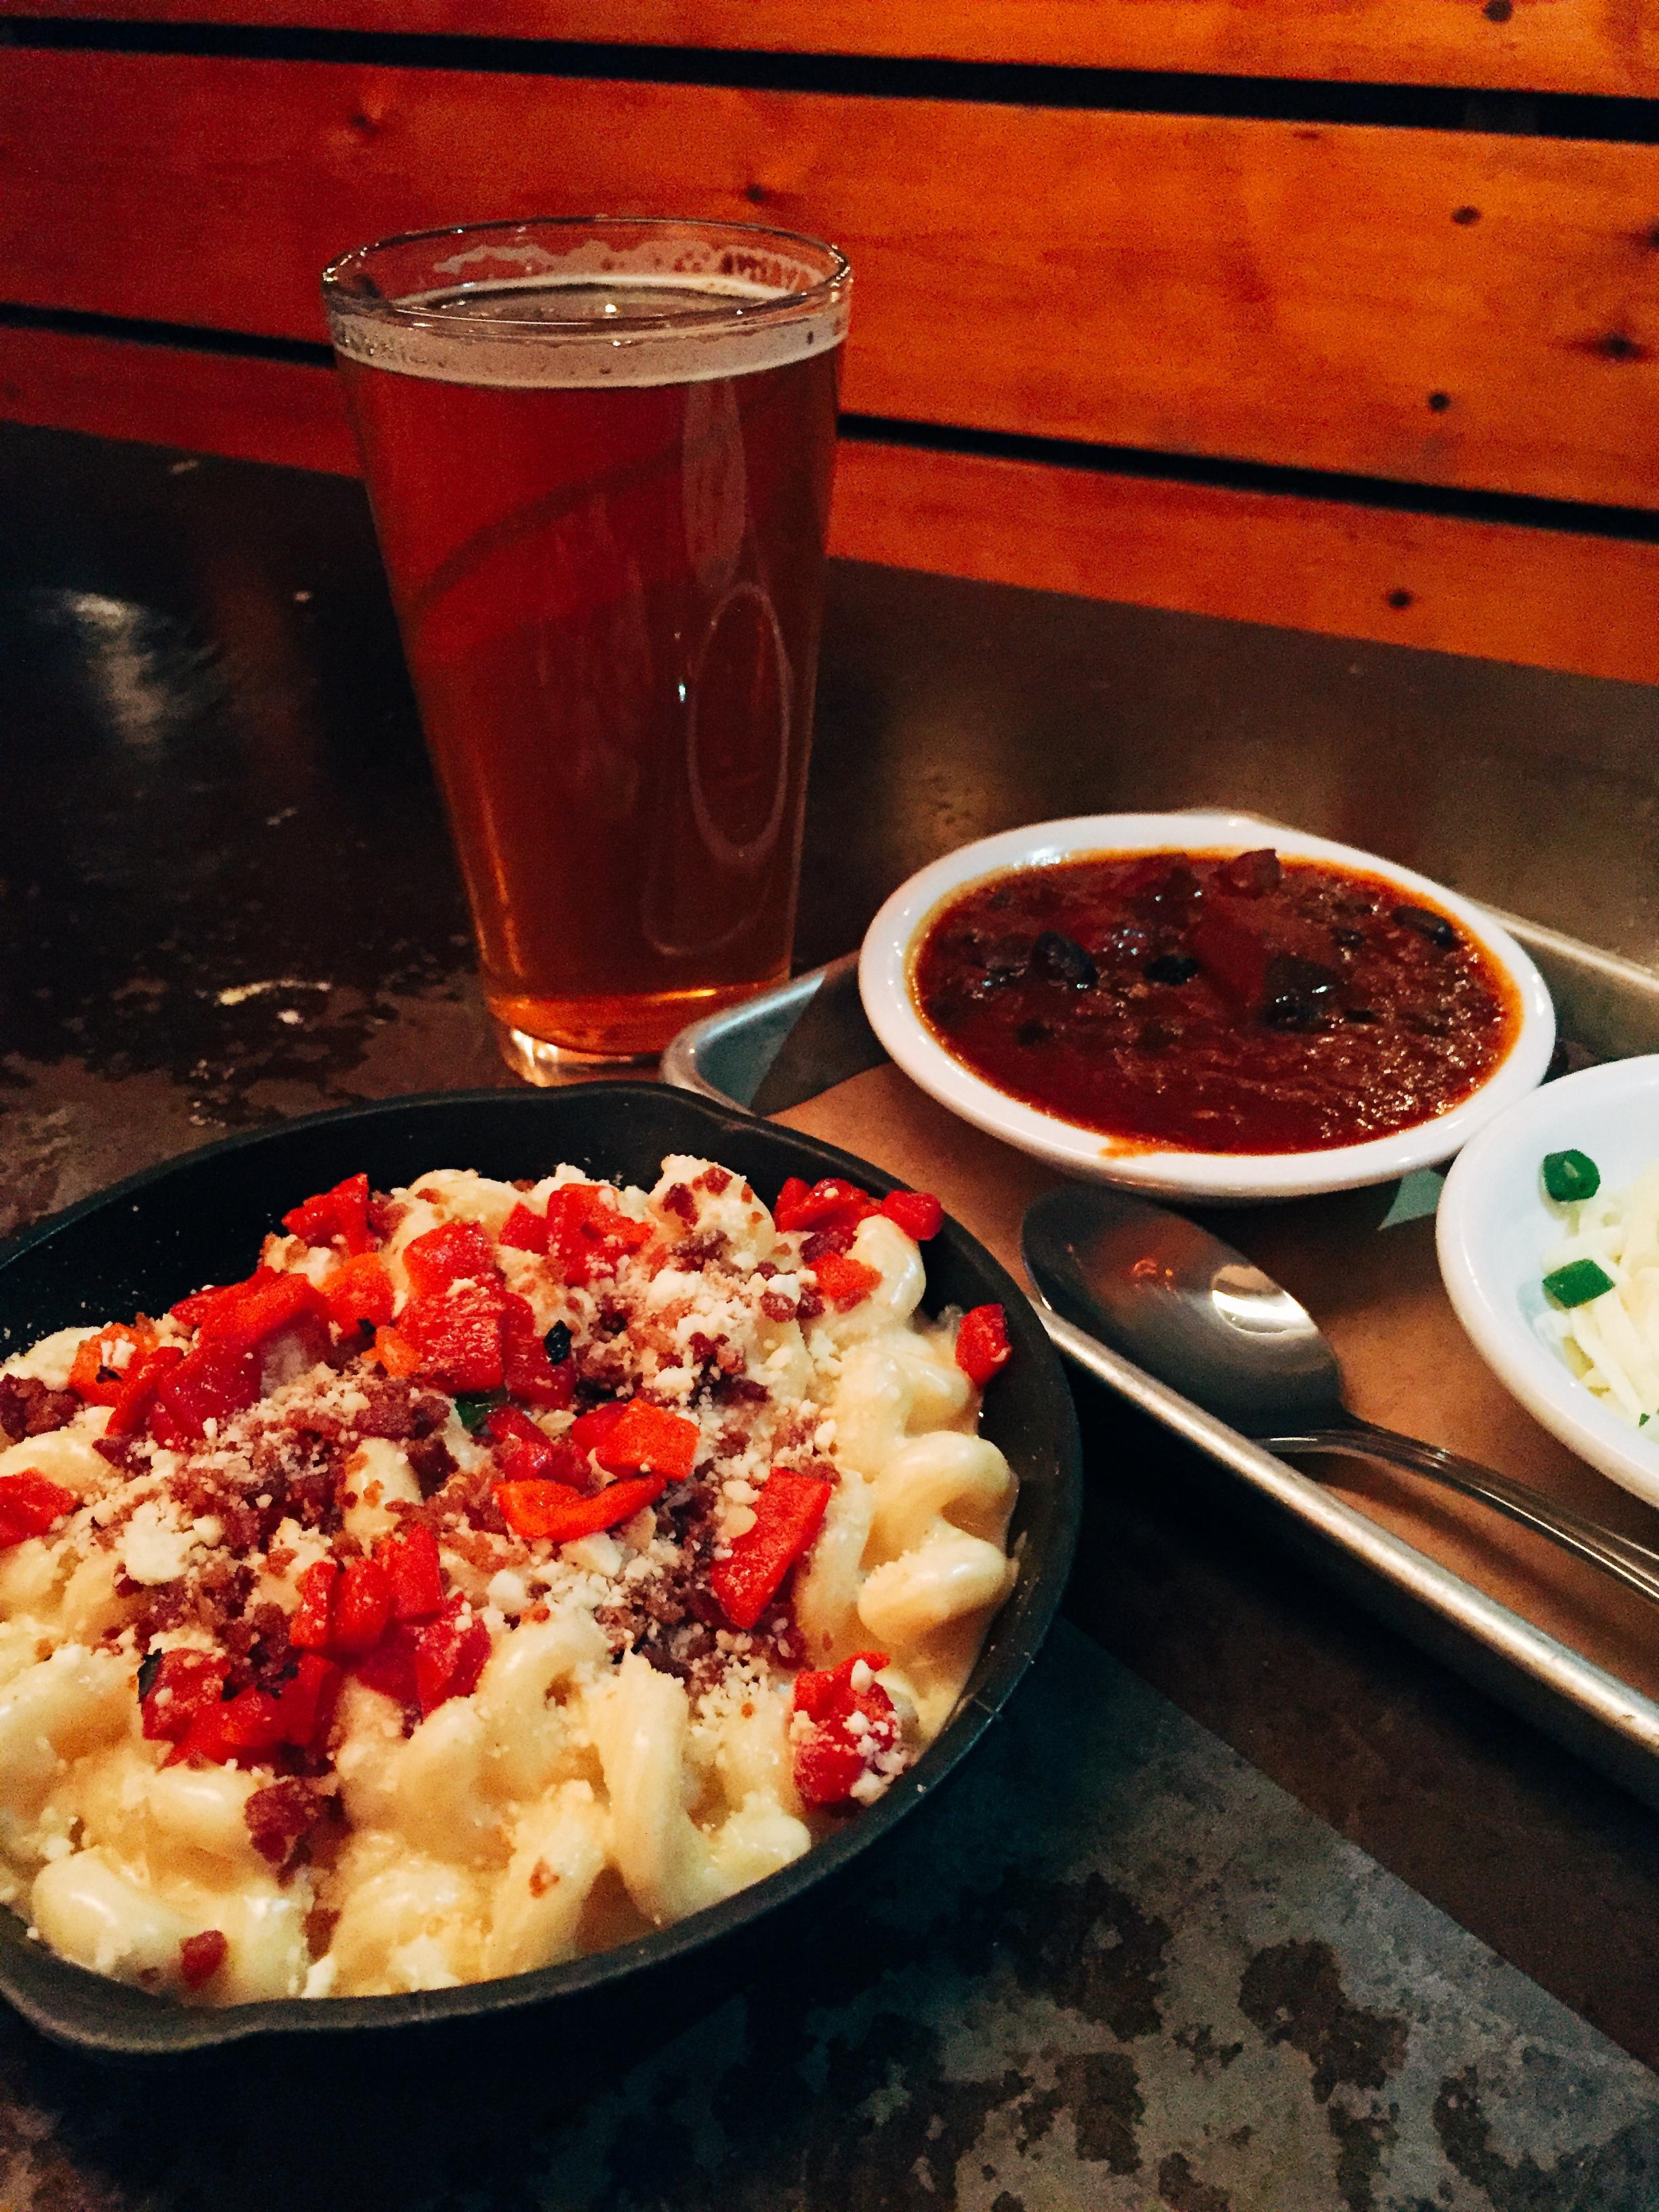 Bacon and smoked feta mac and cheese skillet and their award winning chili